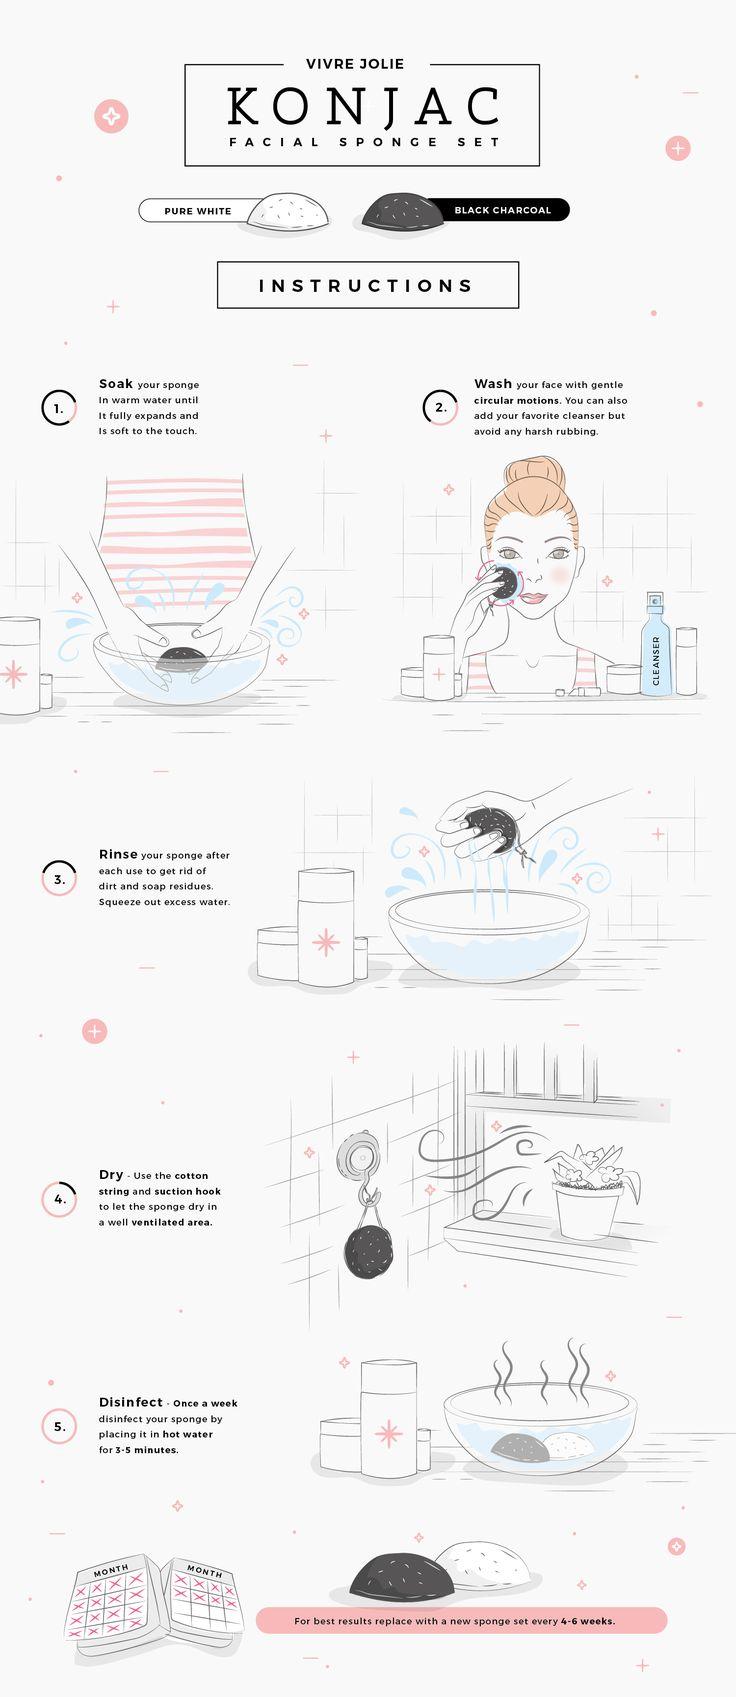 How To Use a Konjac Sponge to Cleanse & Exfoliate Your Skin  #konjacsponge